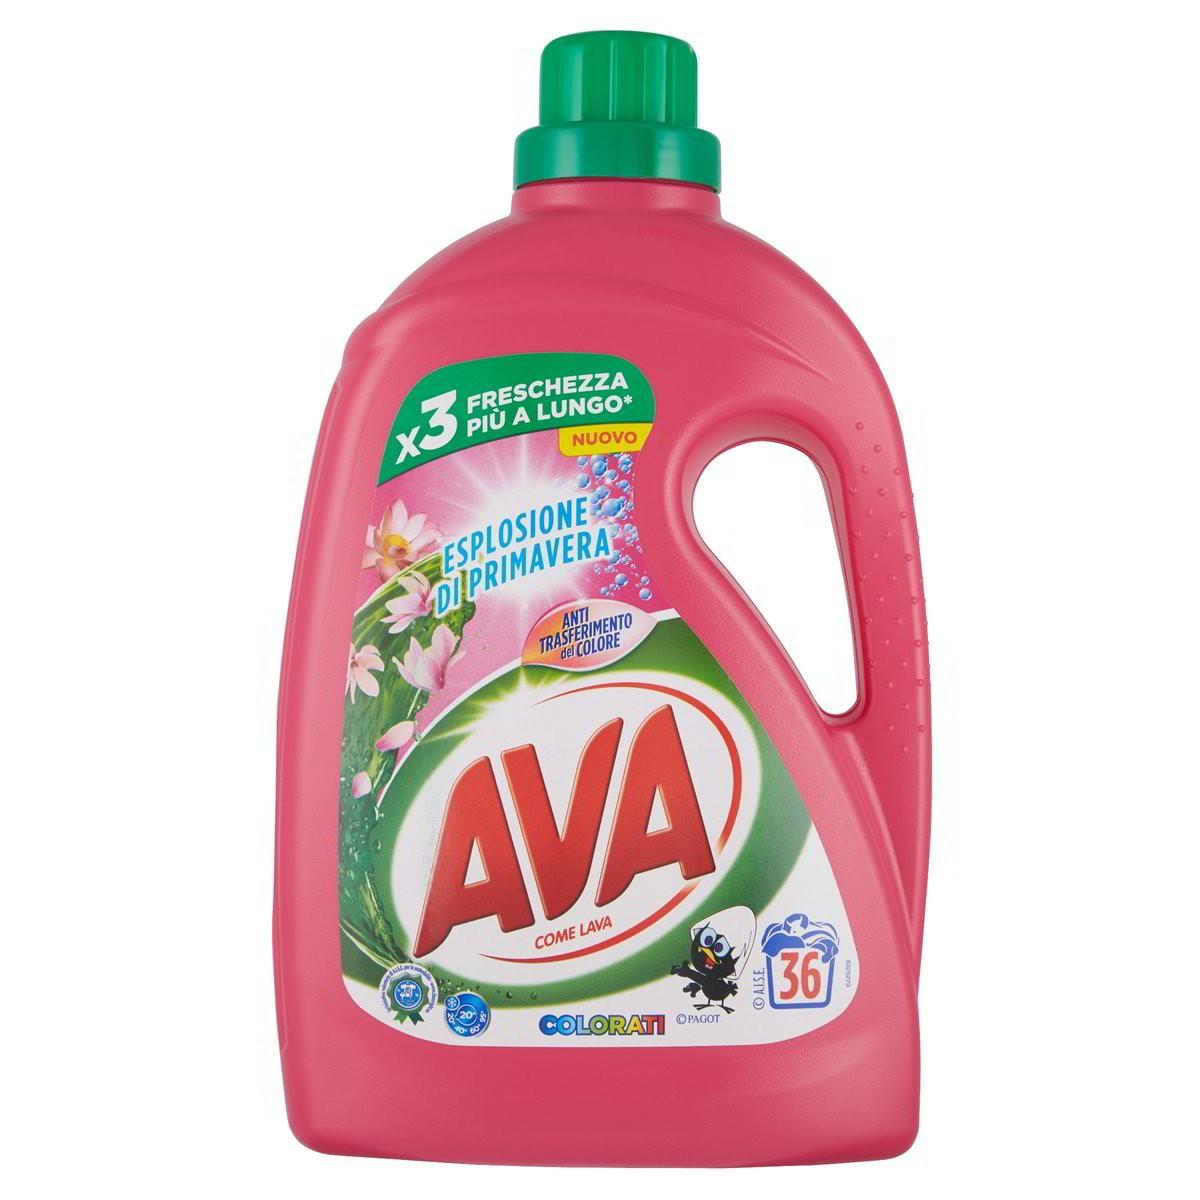 Ava Detersivo liquido lavatrice